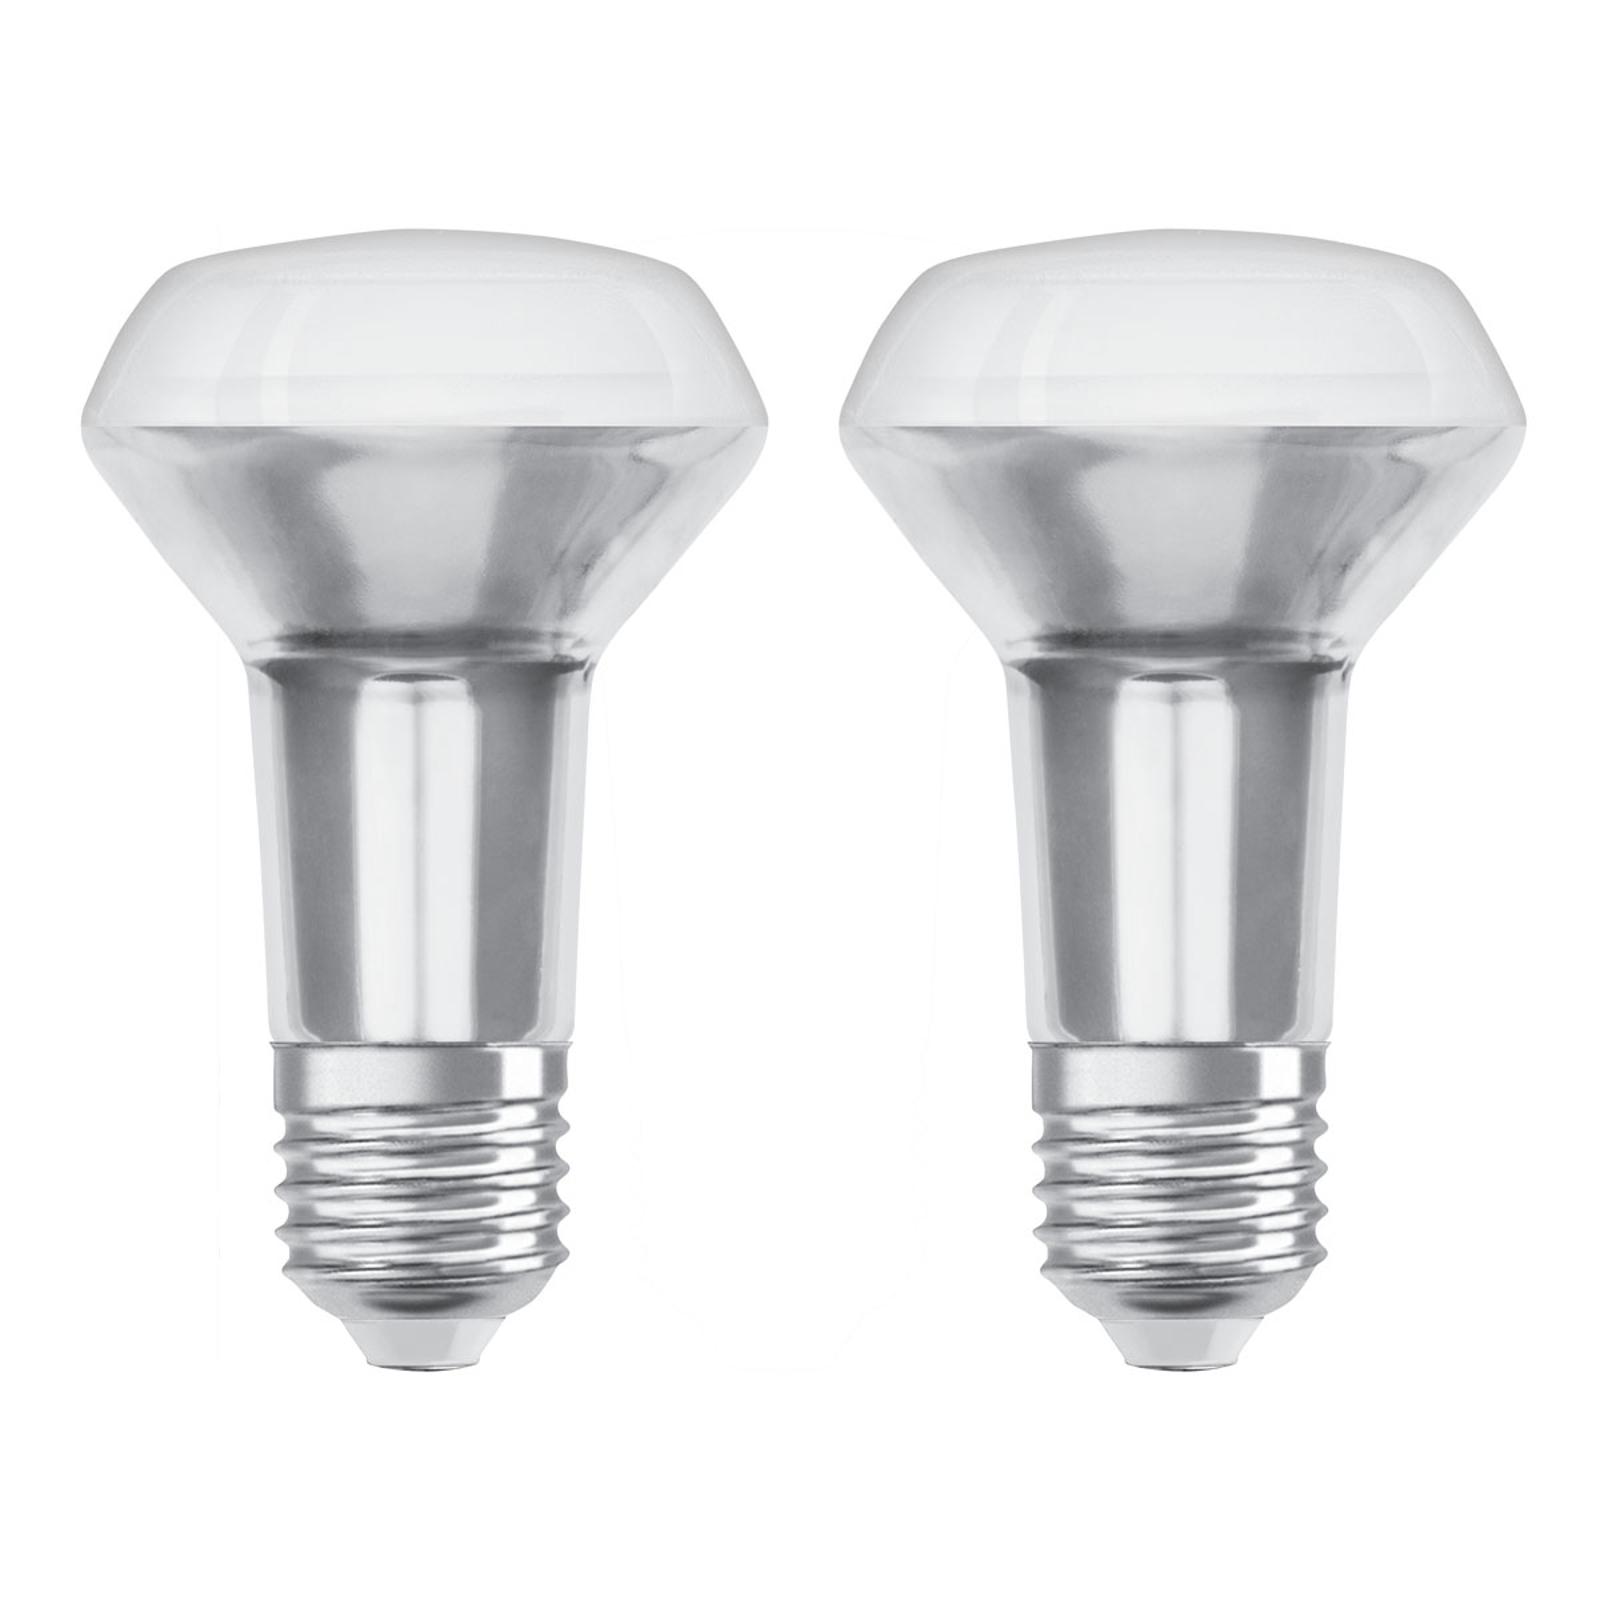 OSRAM reflektor LED E27 3,3W 2700K 36° 2 szt.